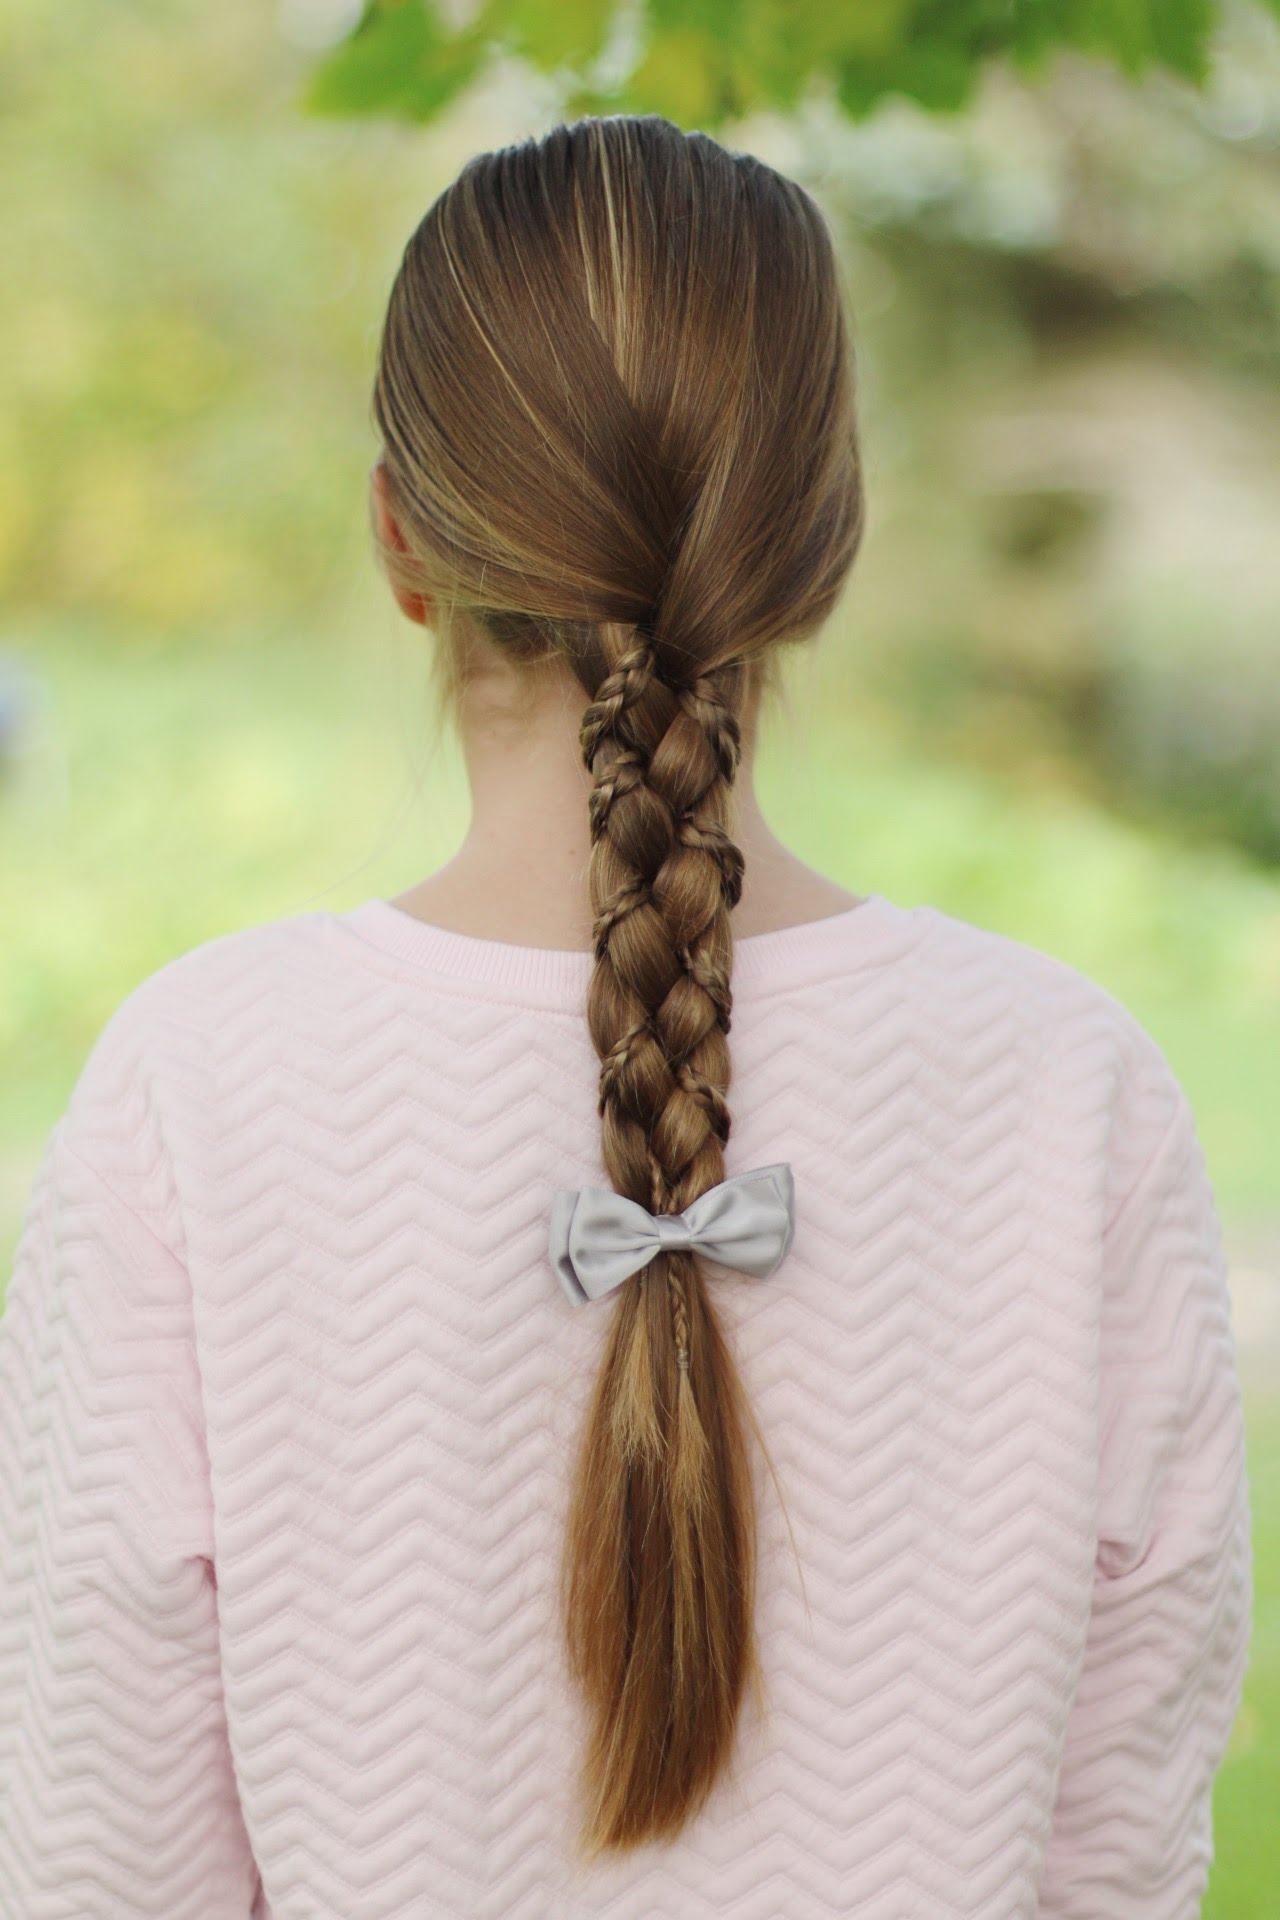 Hair Braiding Styles (View 3 of 20)